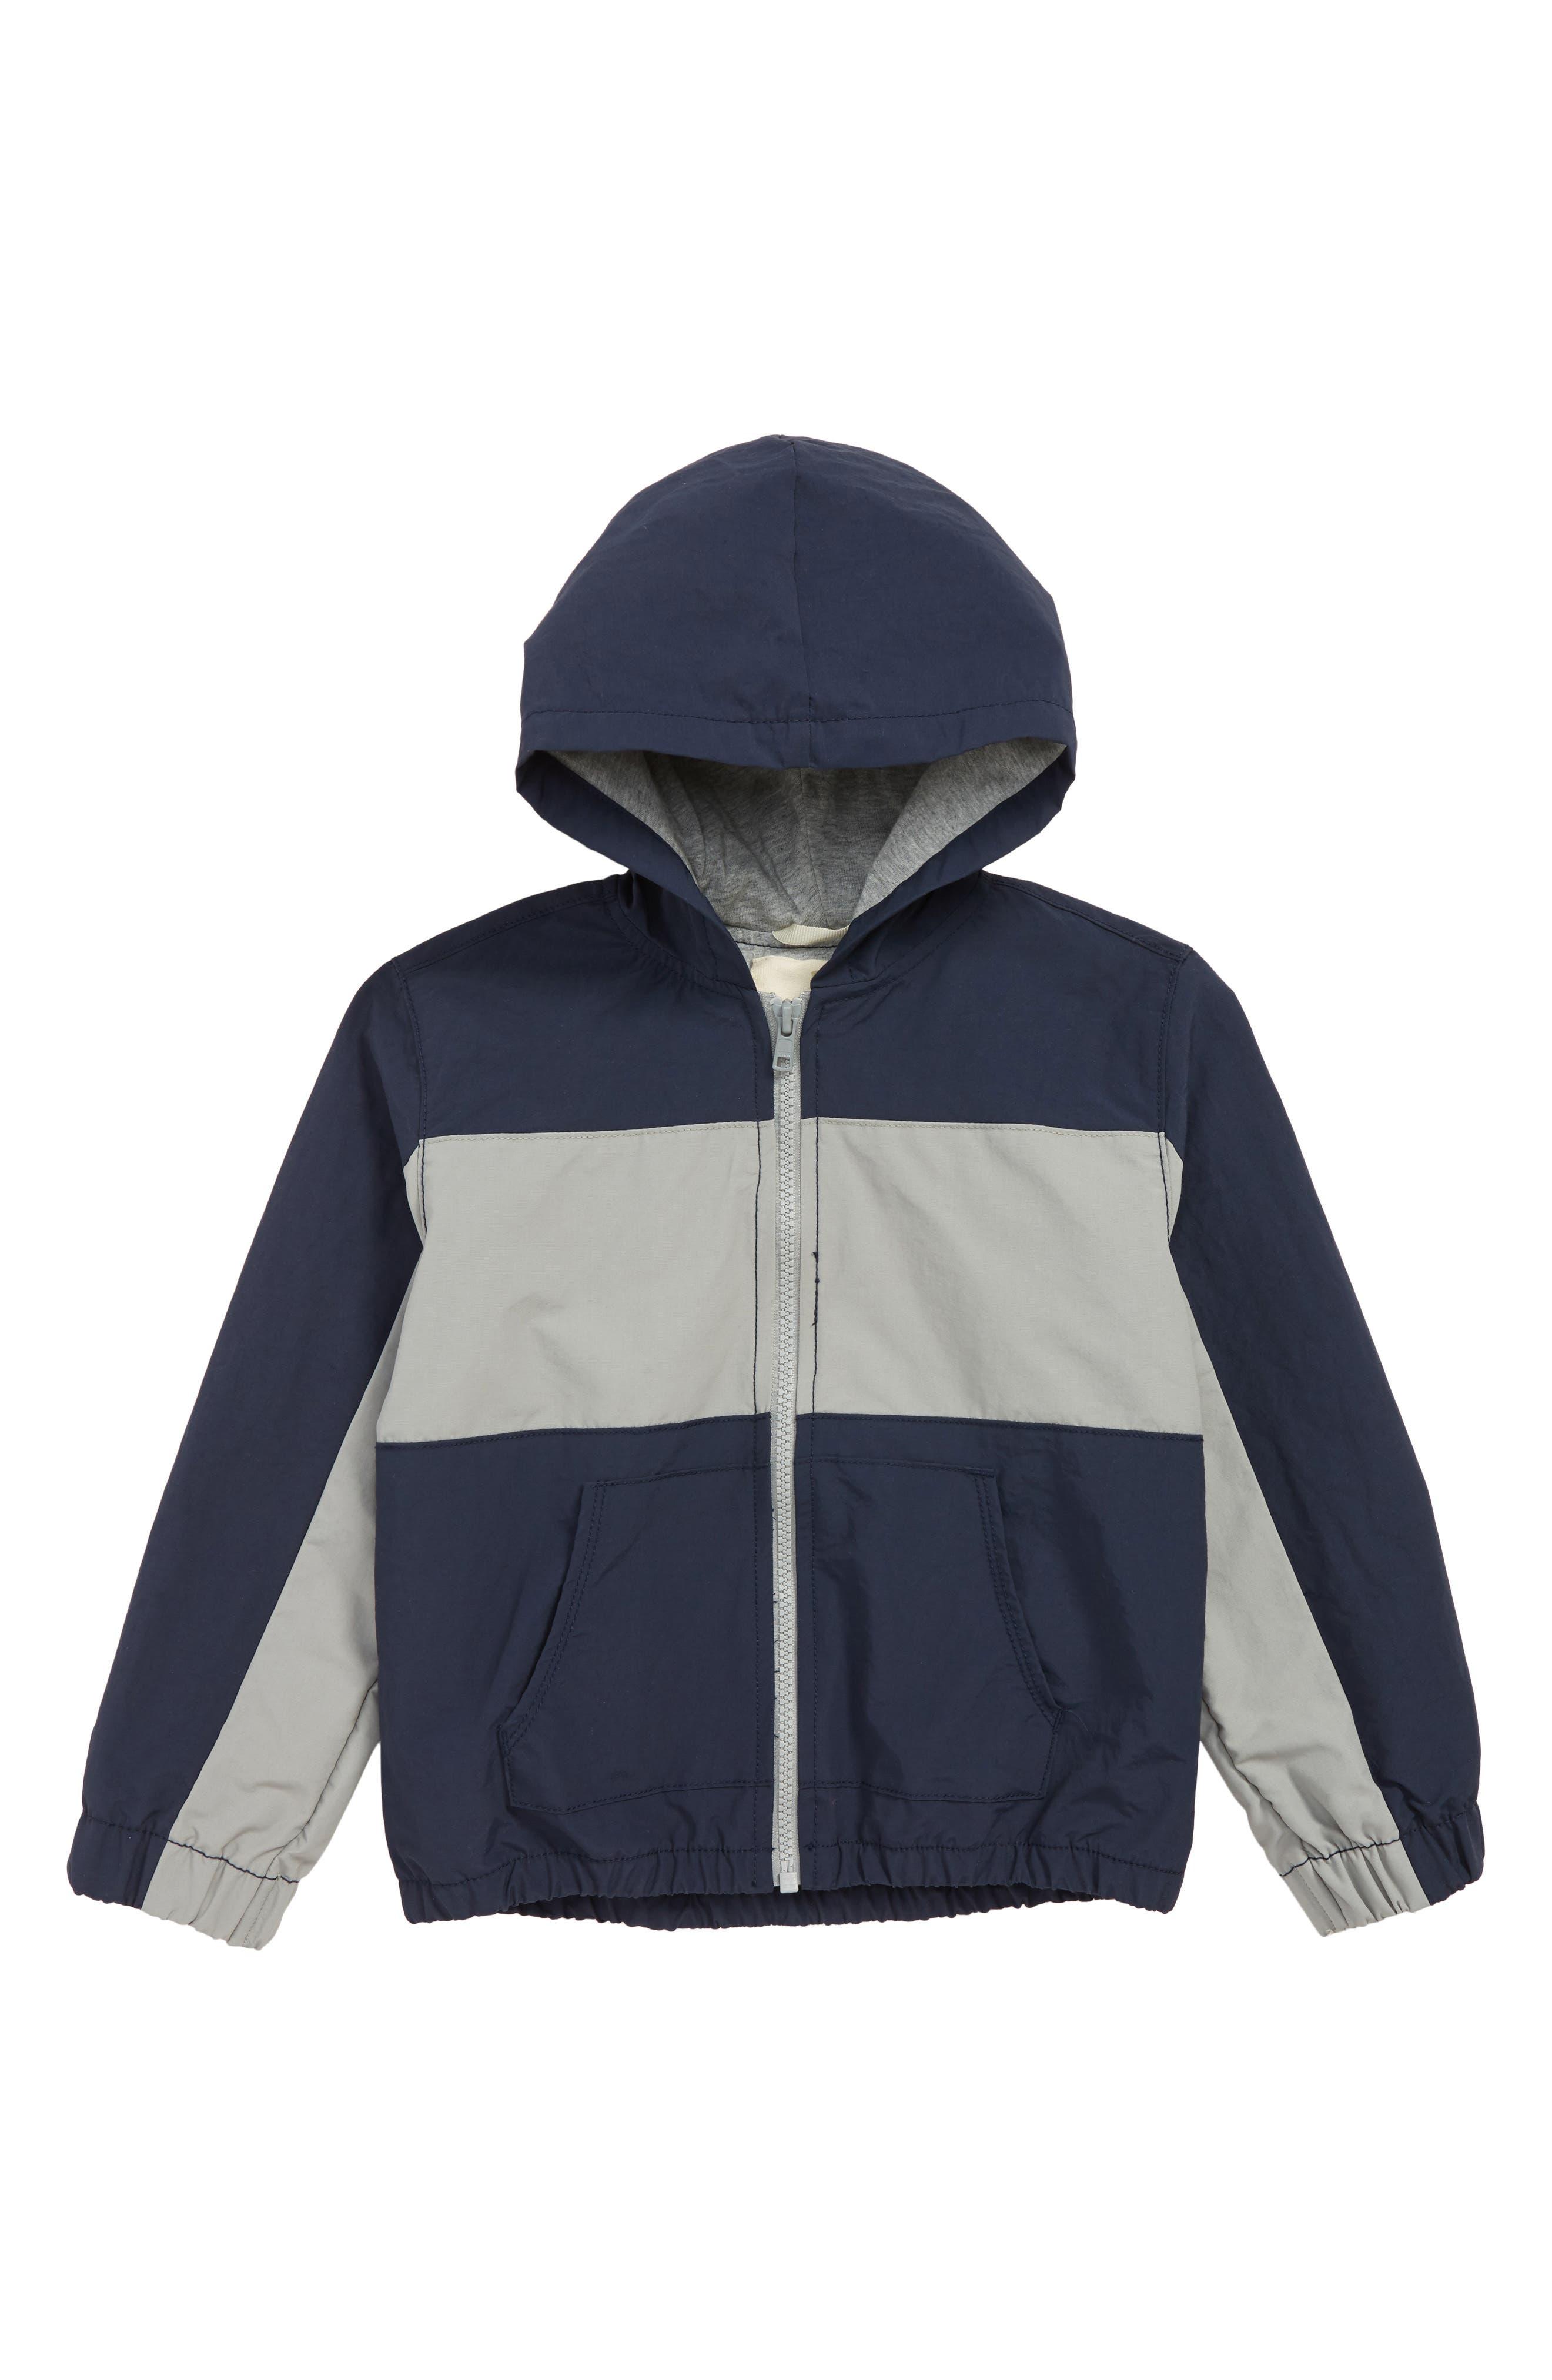 Get Outside Colorblock Hooded Jacket,                             Main thumbnail 1, color,                             NAVY BLAZER- GREY